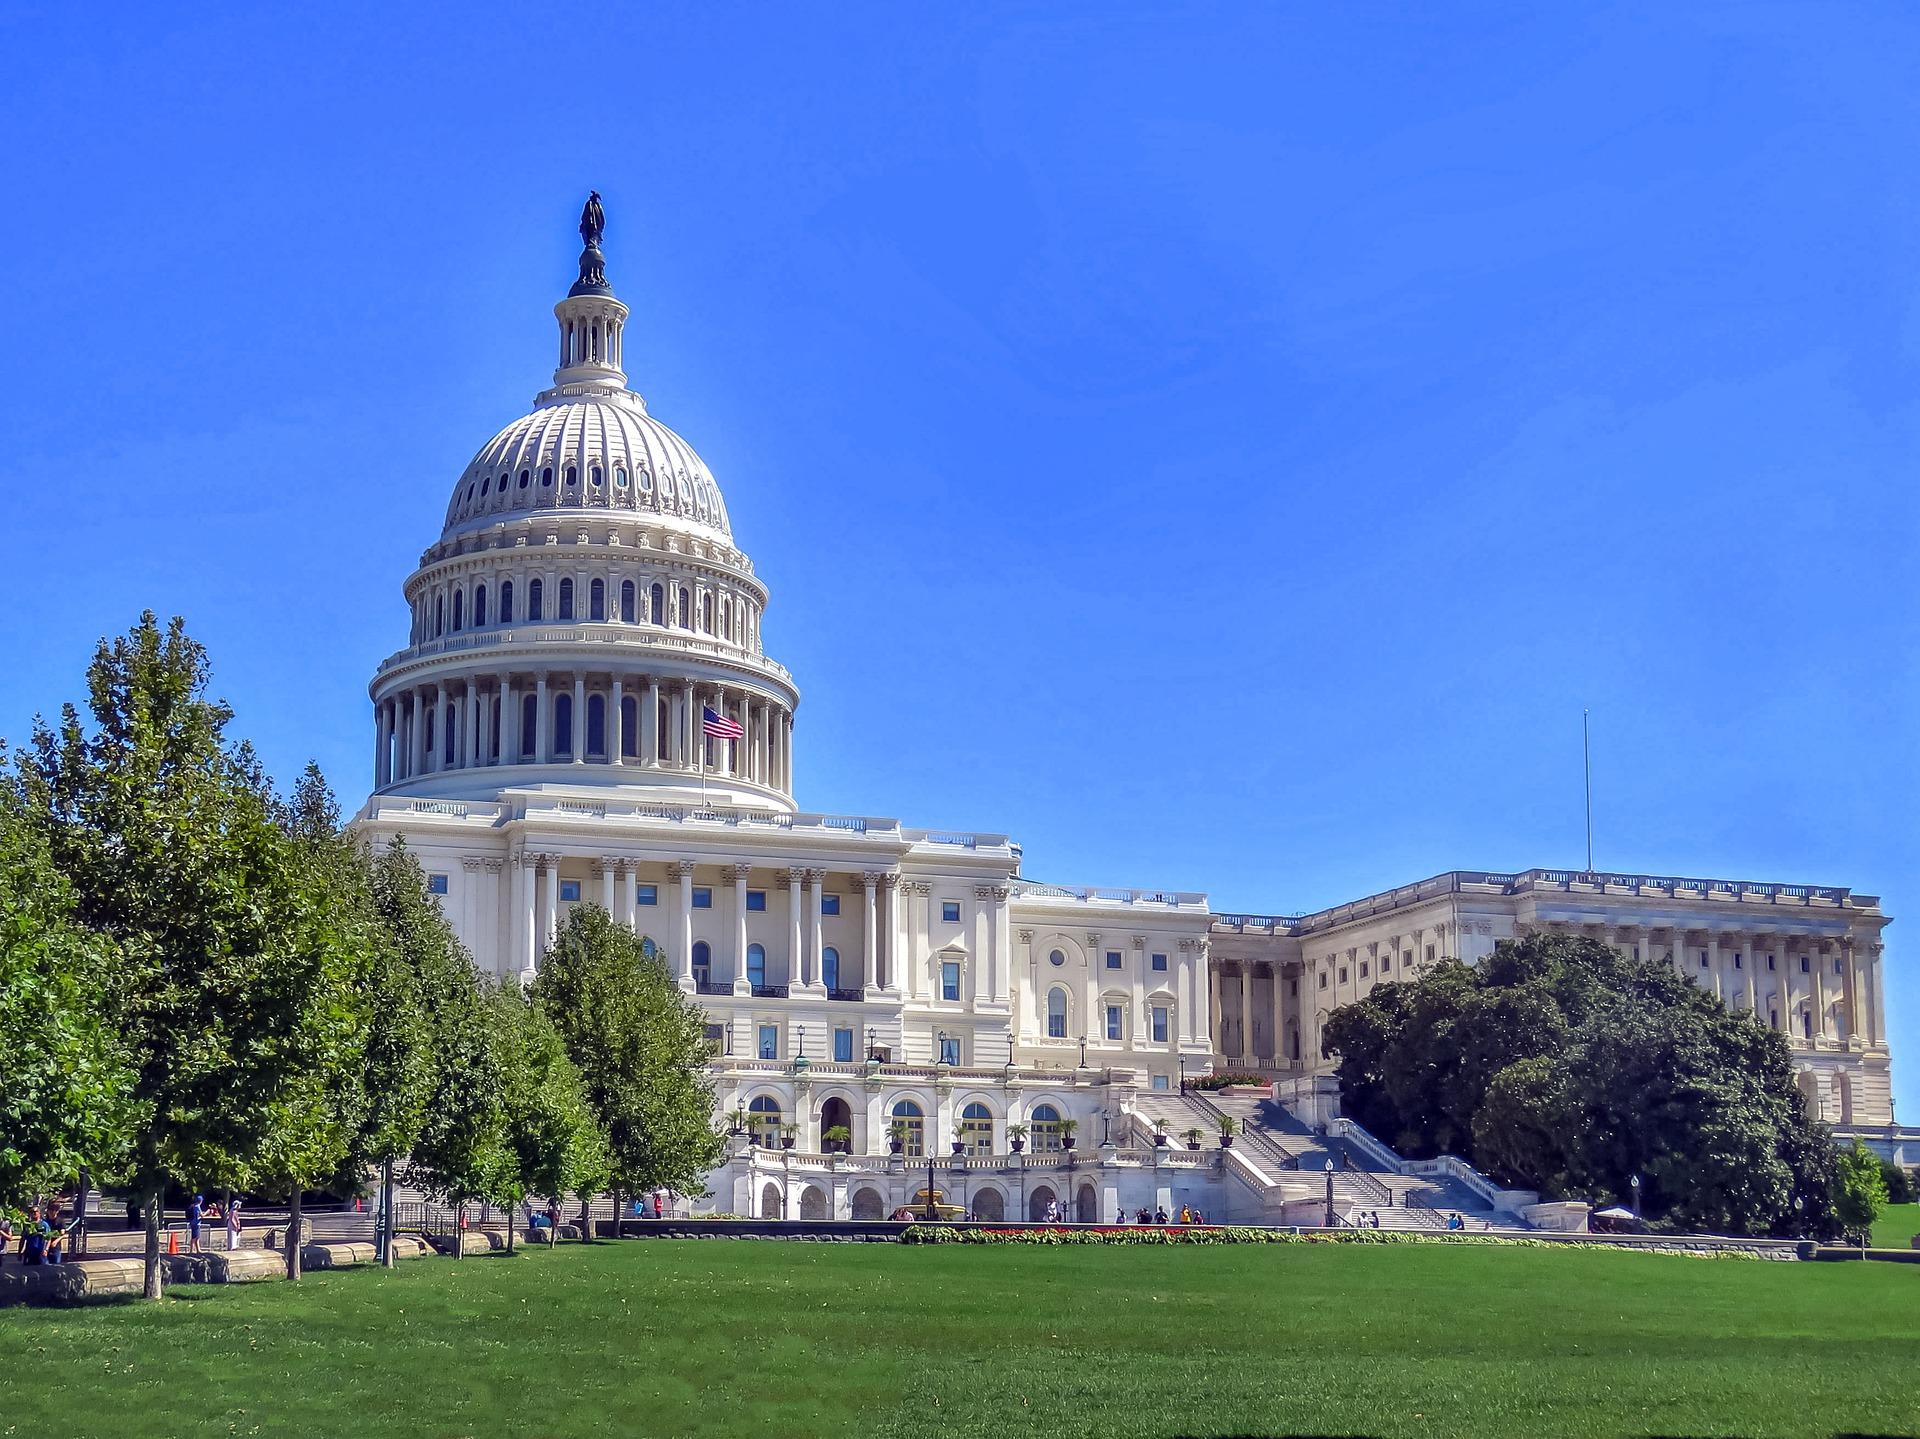 Nancy Pelosi Demands Removal Of Confederate Statues